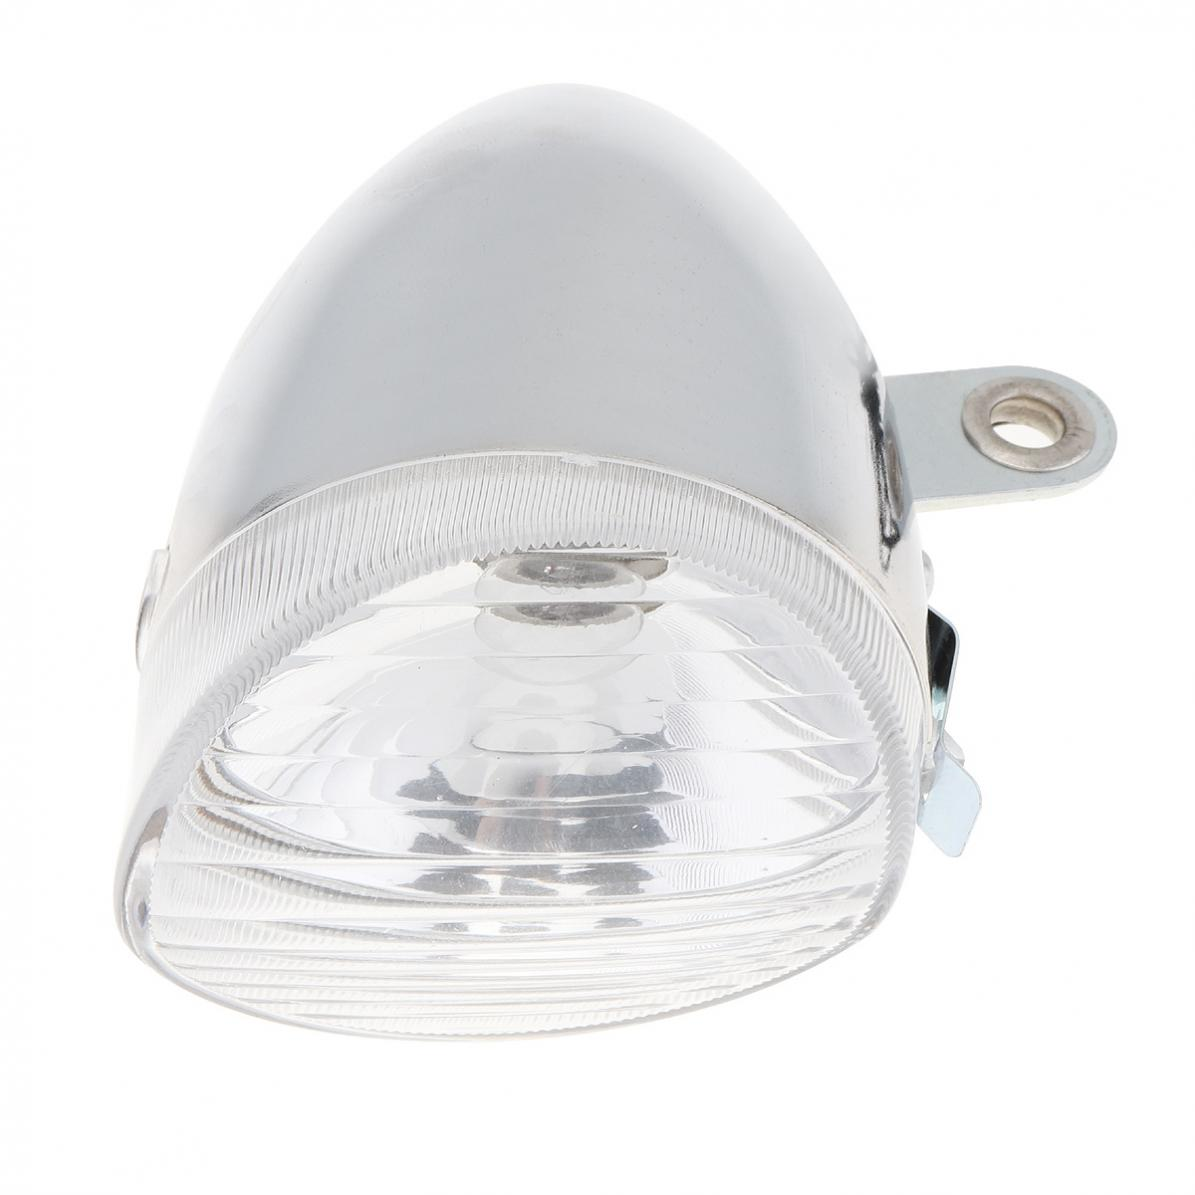 6V 3W White Bike Bicycle Dynamo Lights LED Front Light Headlight Rear Light